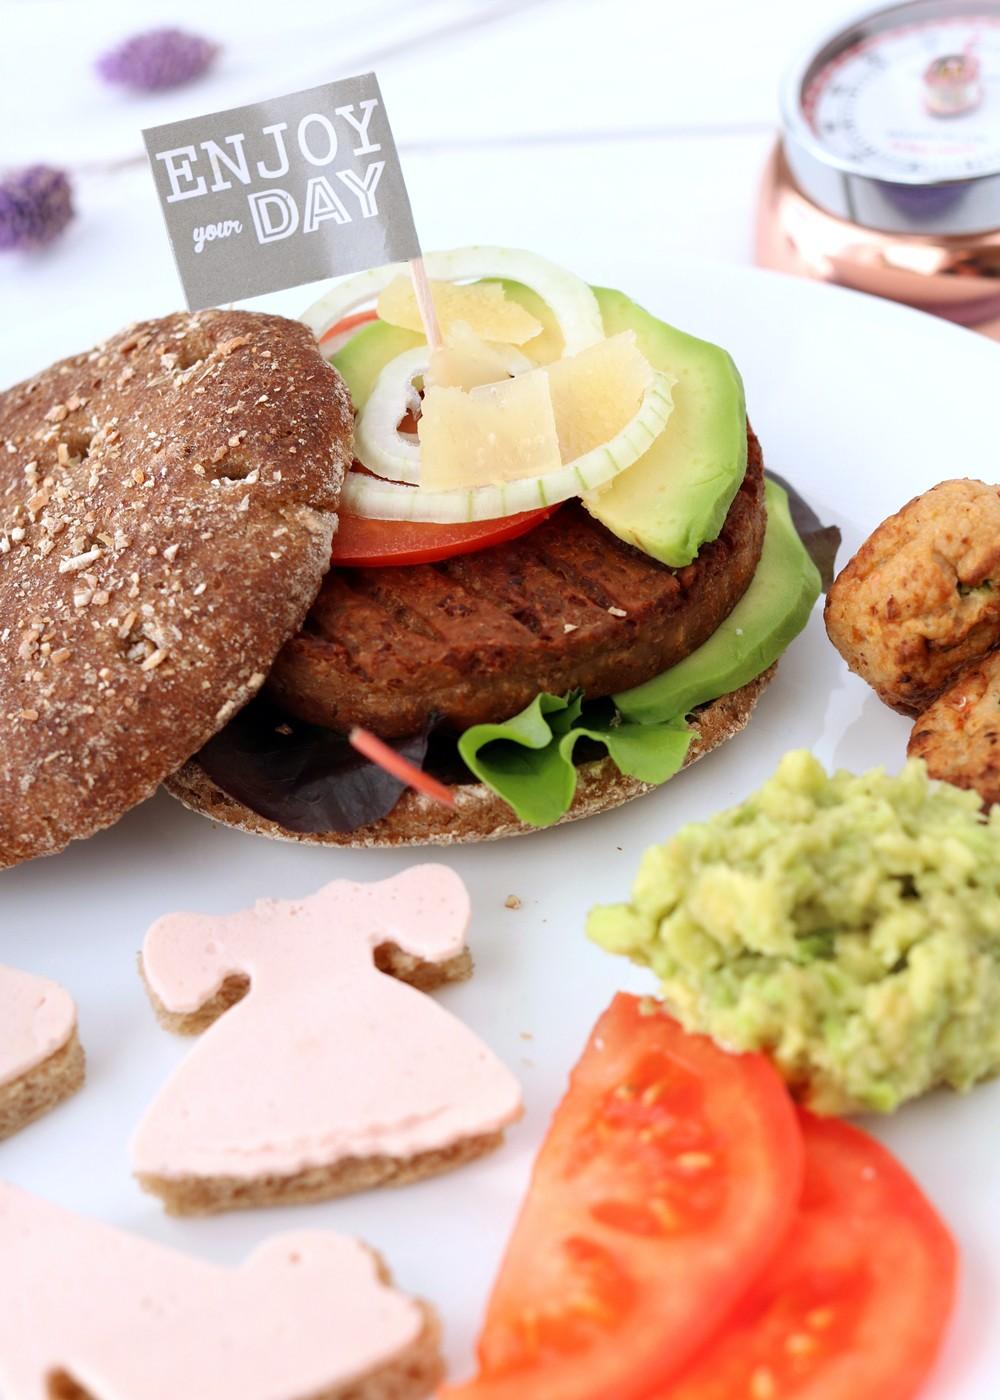 Fashion meets Food Blogparade Blogger Lobster of the year Award Burger Rügenwalder Mühle (5)